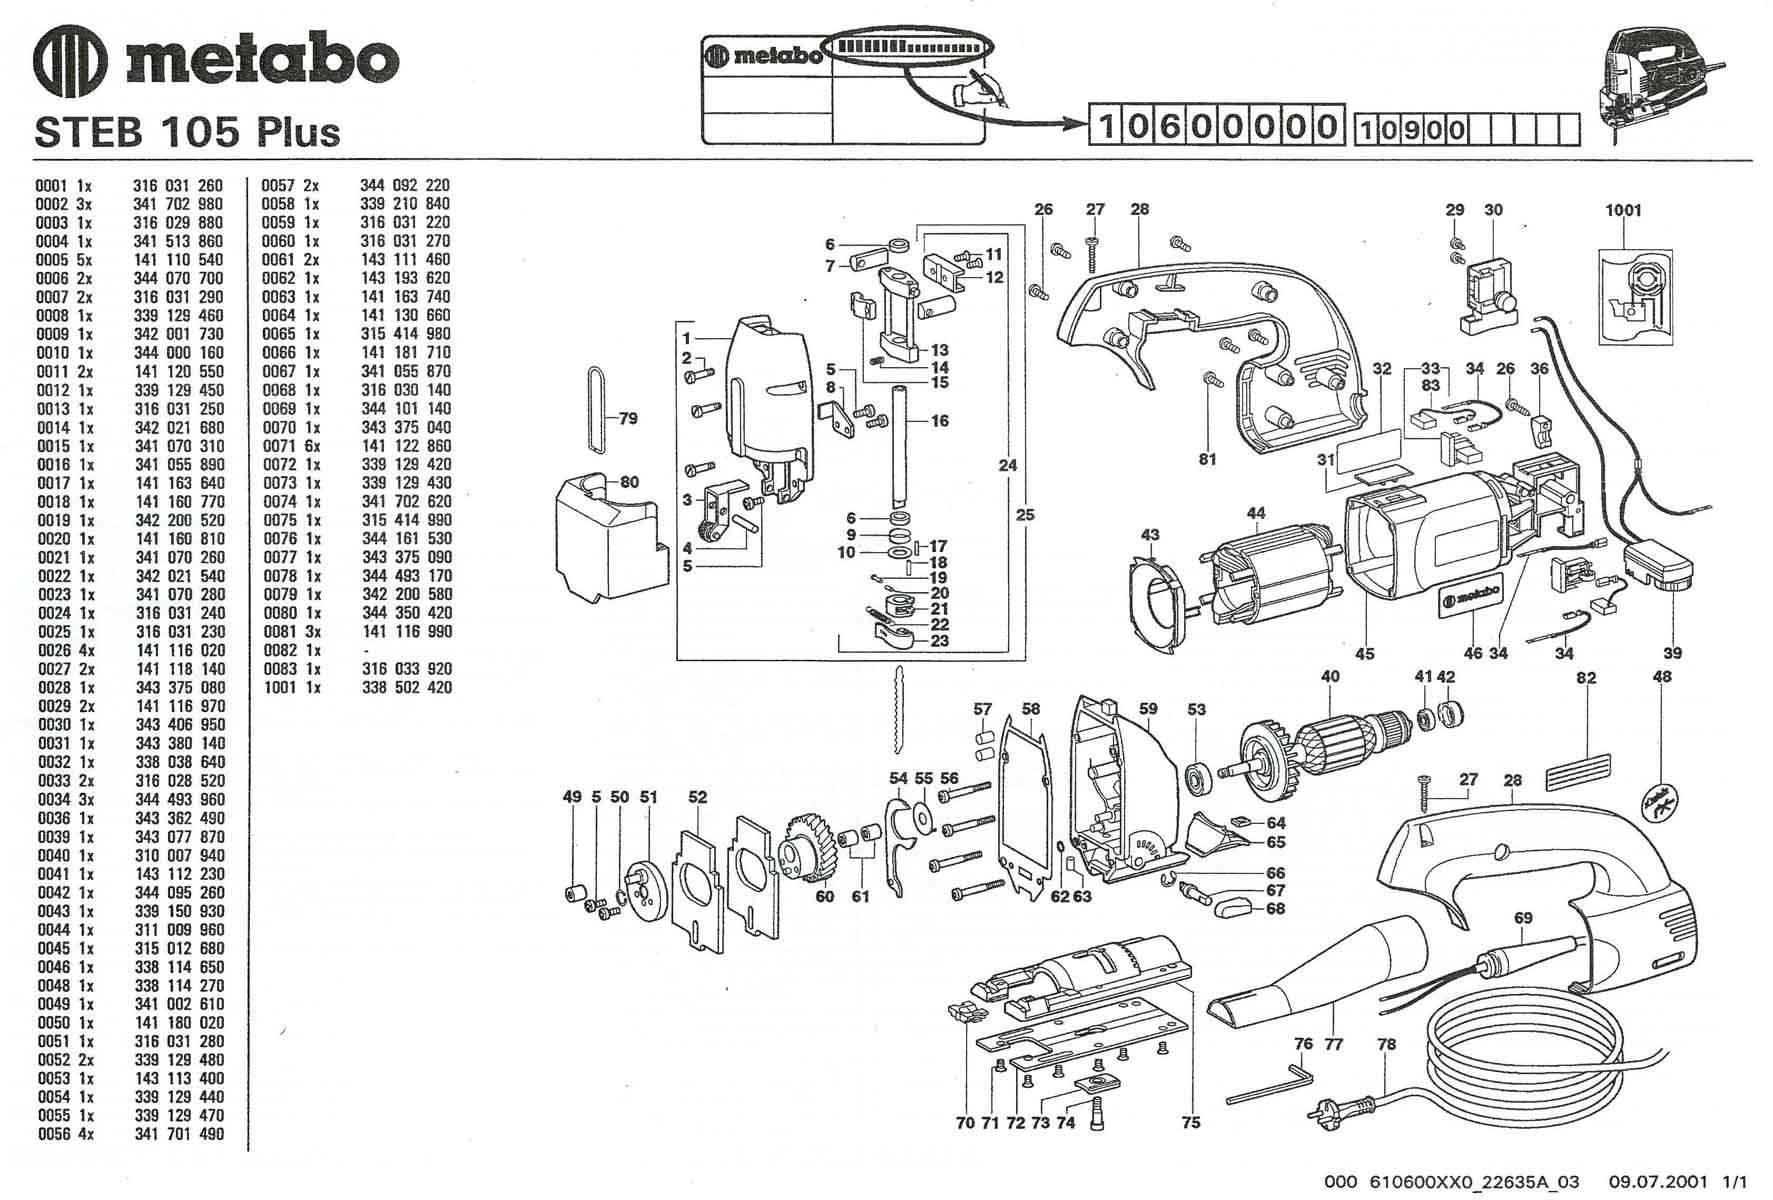 Инструкция по эксплуатации для worx tools wt155, мануалы на.